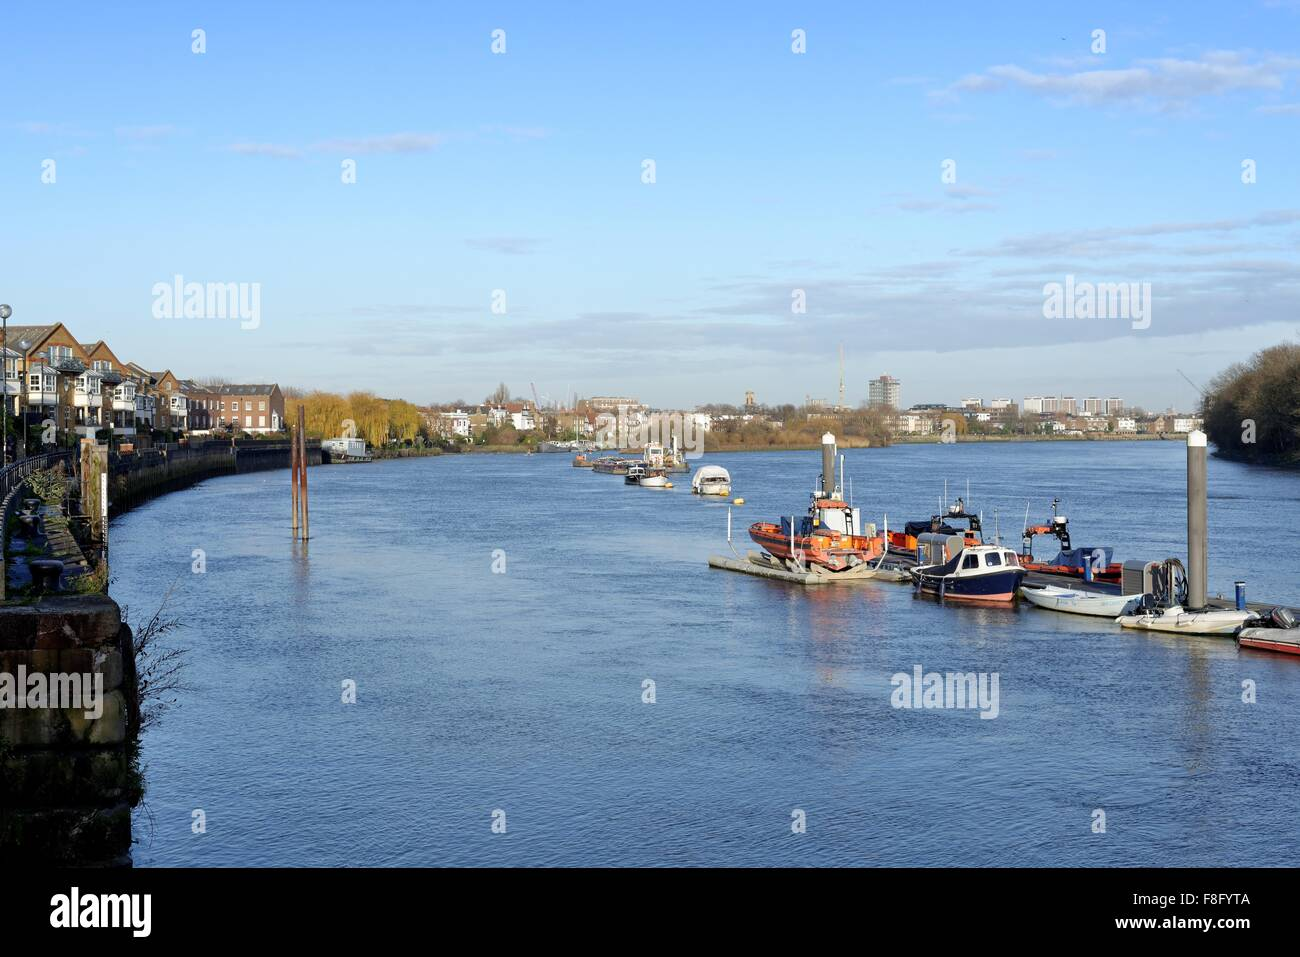 River Thames at Chiswick reach London England UK - Stock Image